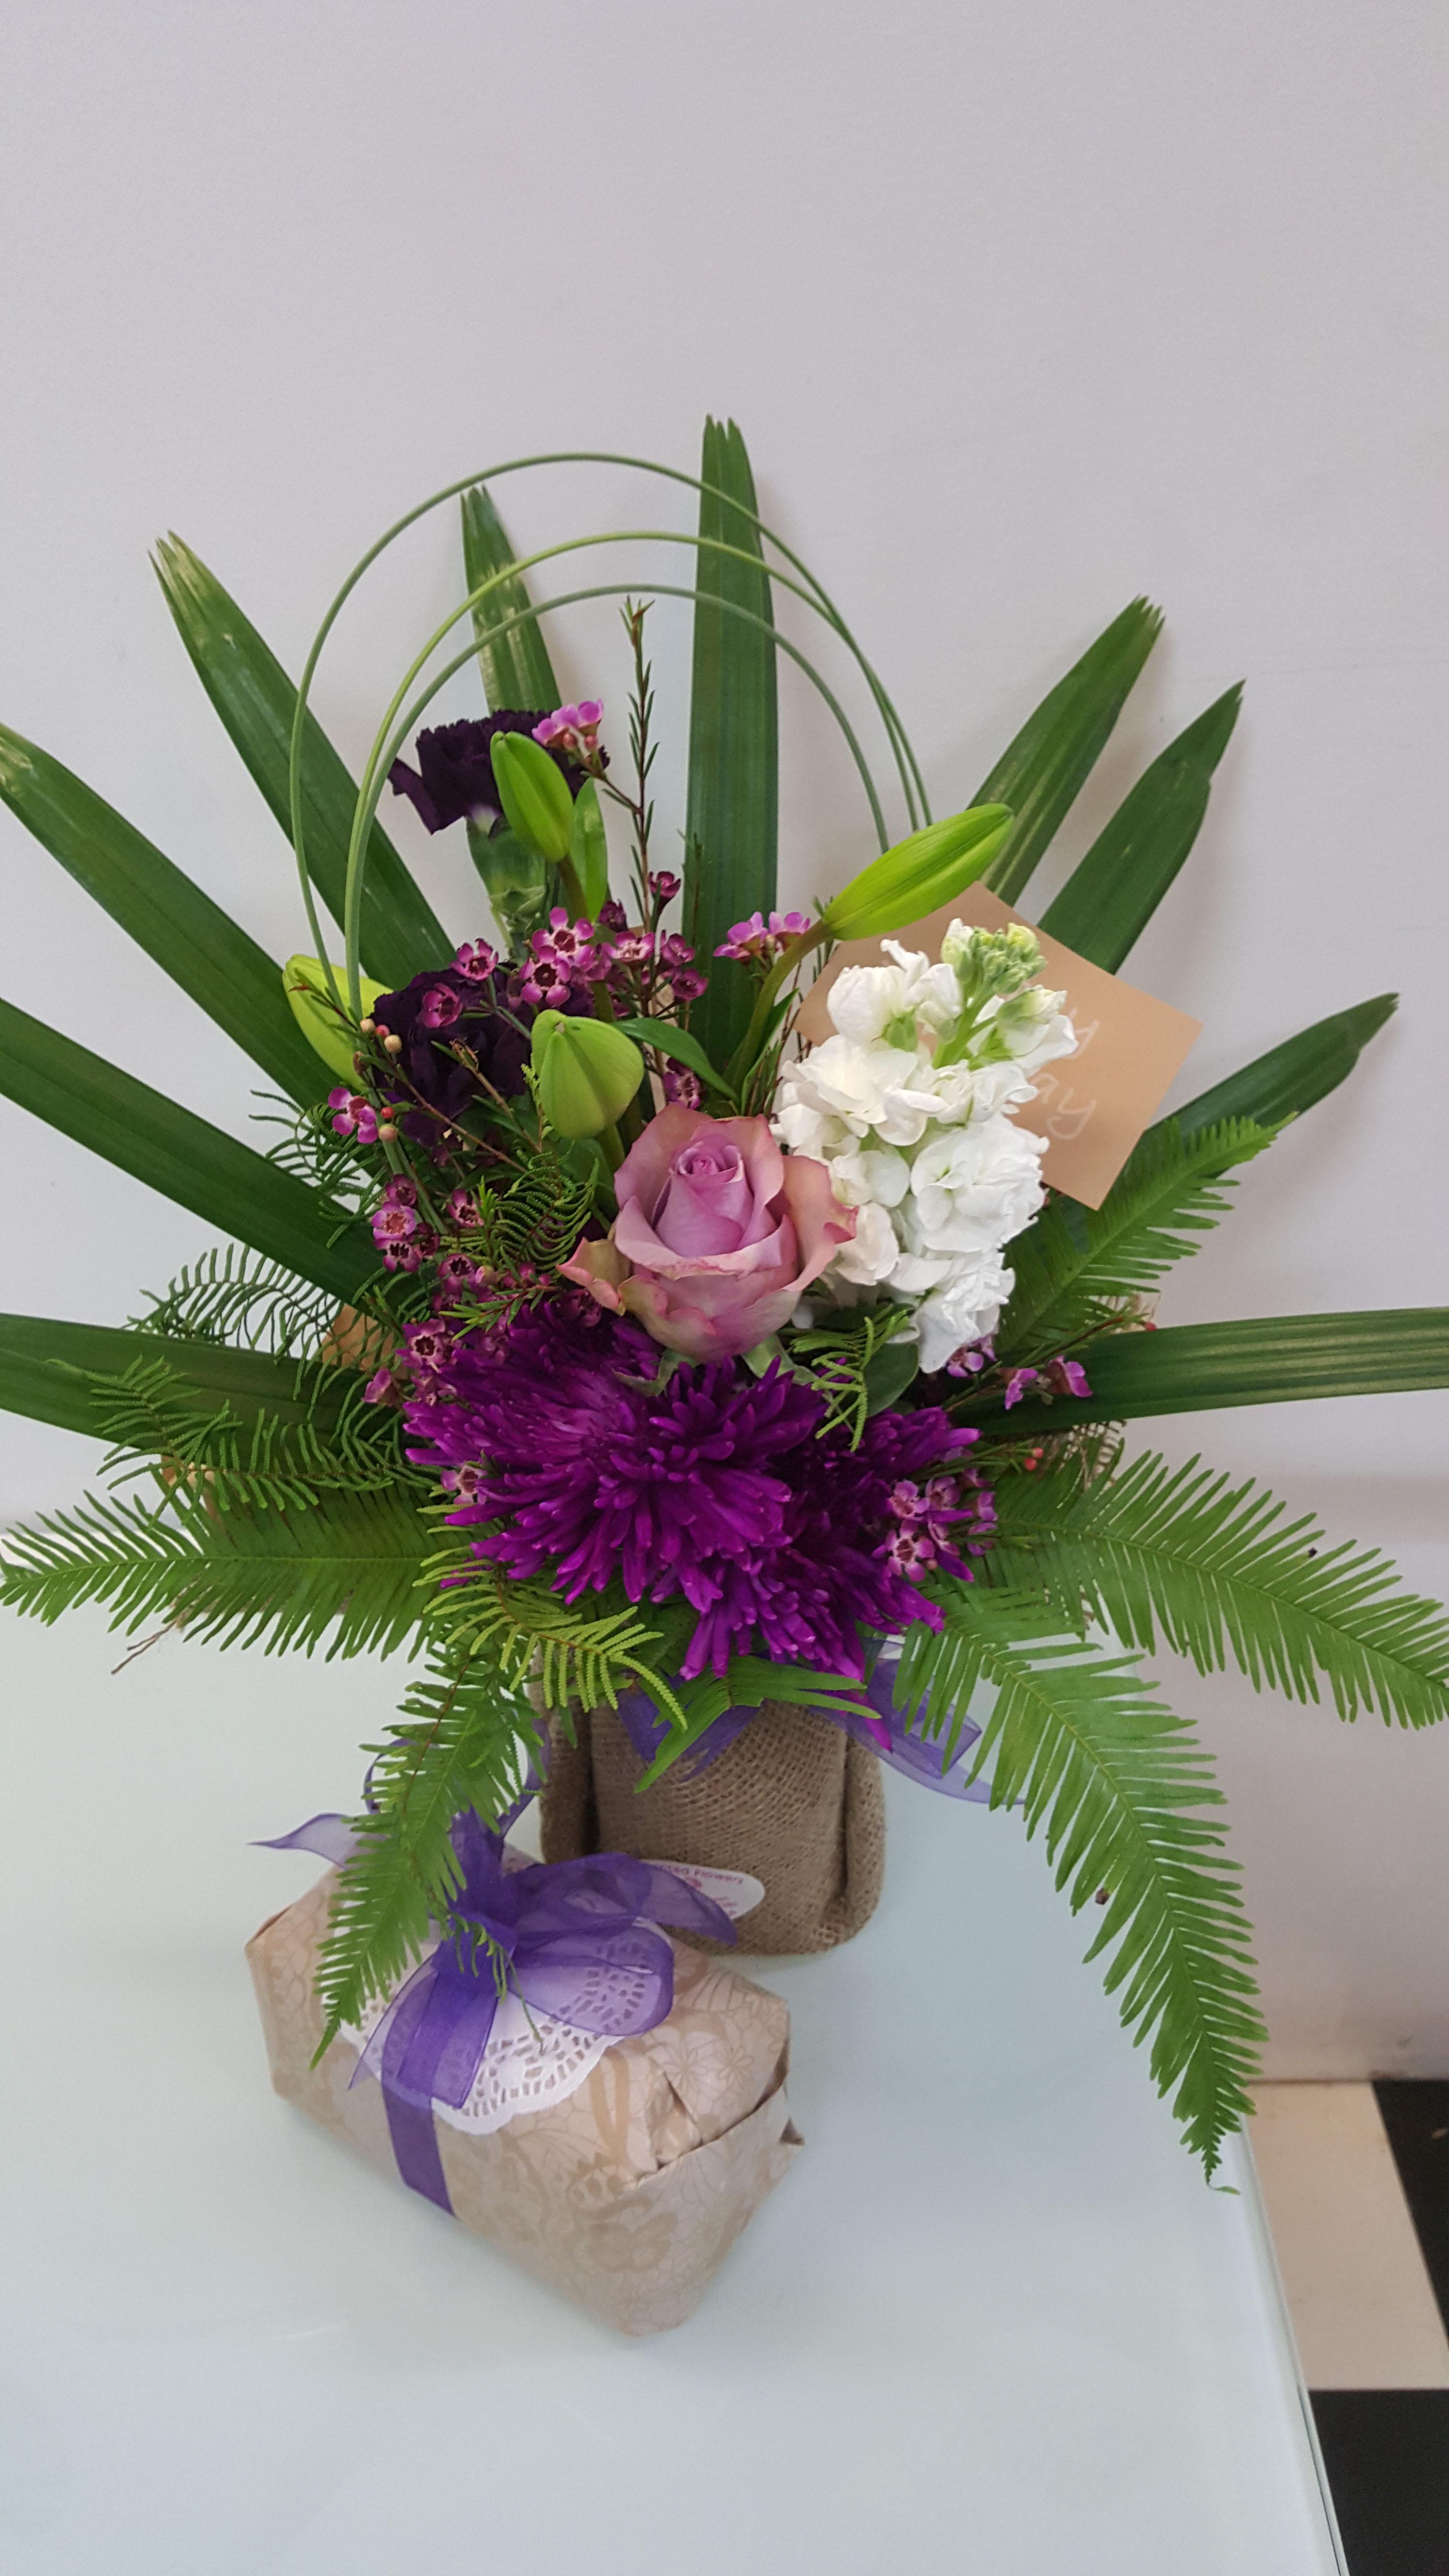 PurpleFlowers & Chocies $50